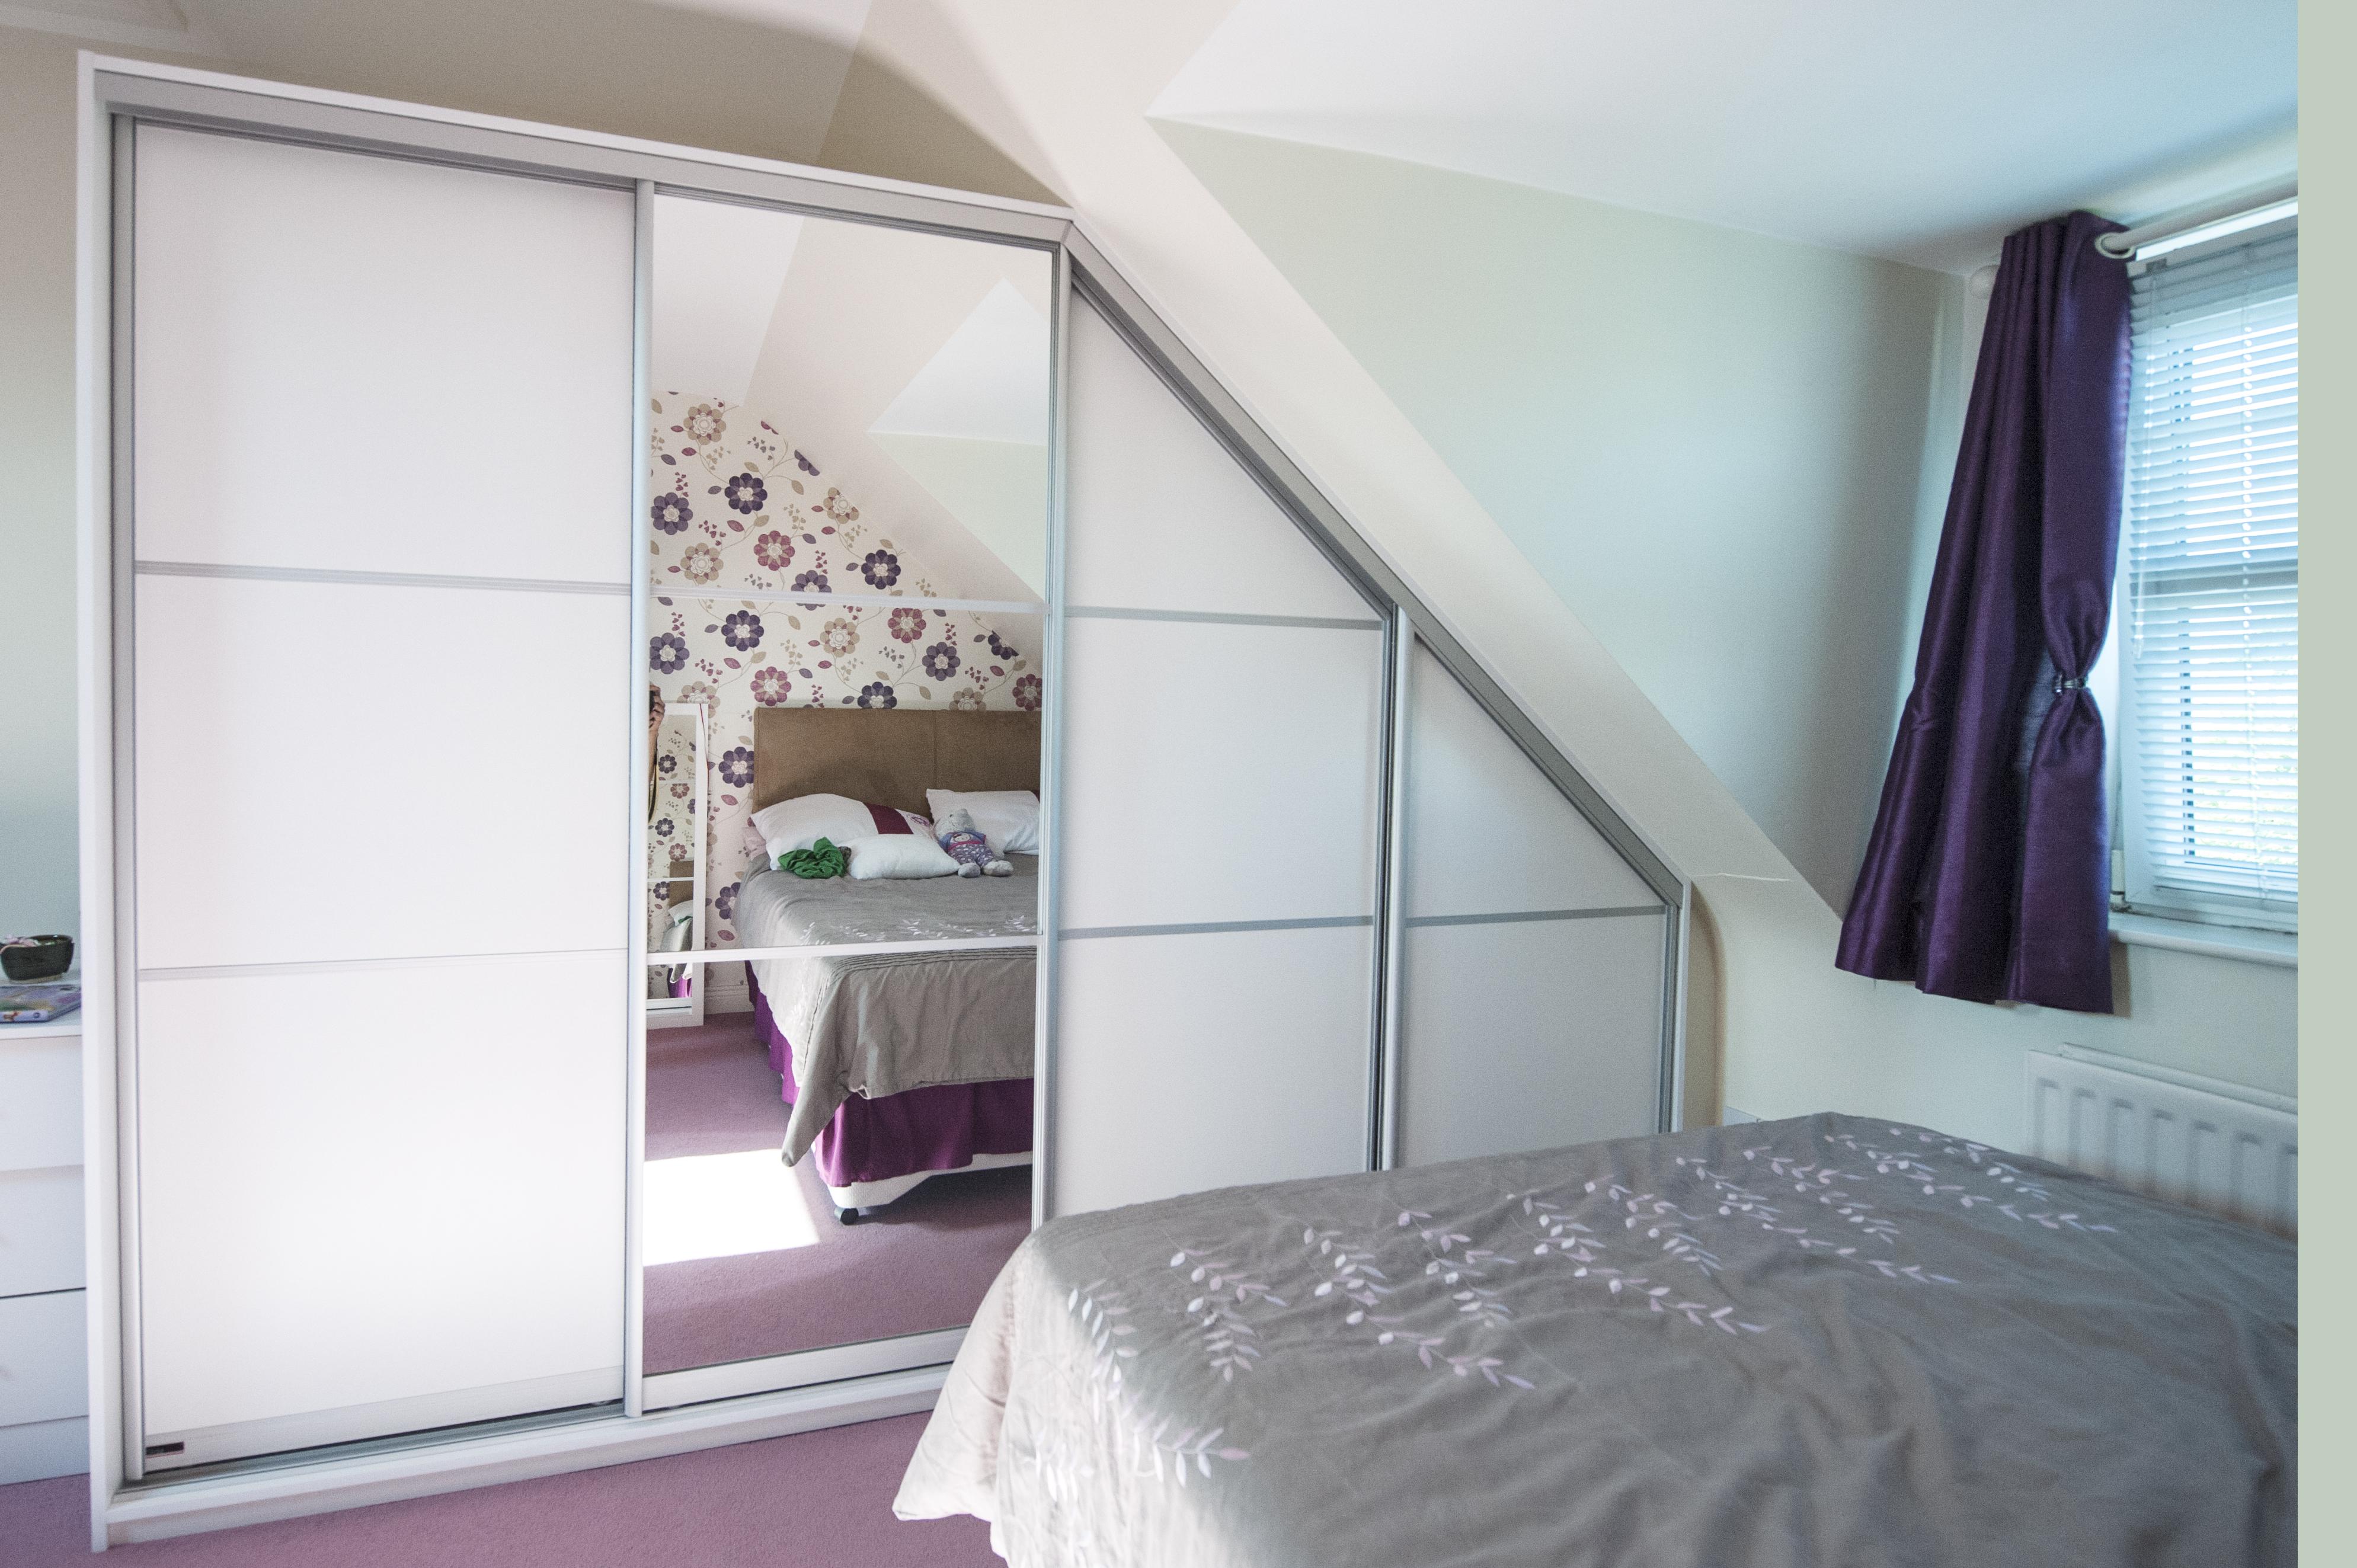 Sloped Ceiling Bedroom Rooms With Sloped Ceiling Slide In Style Sliding Wardrobes